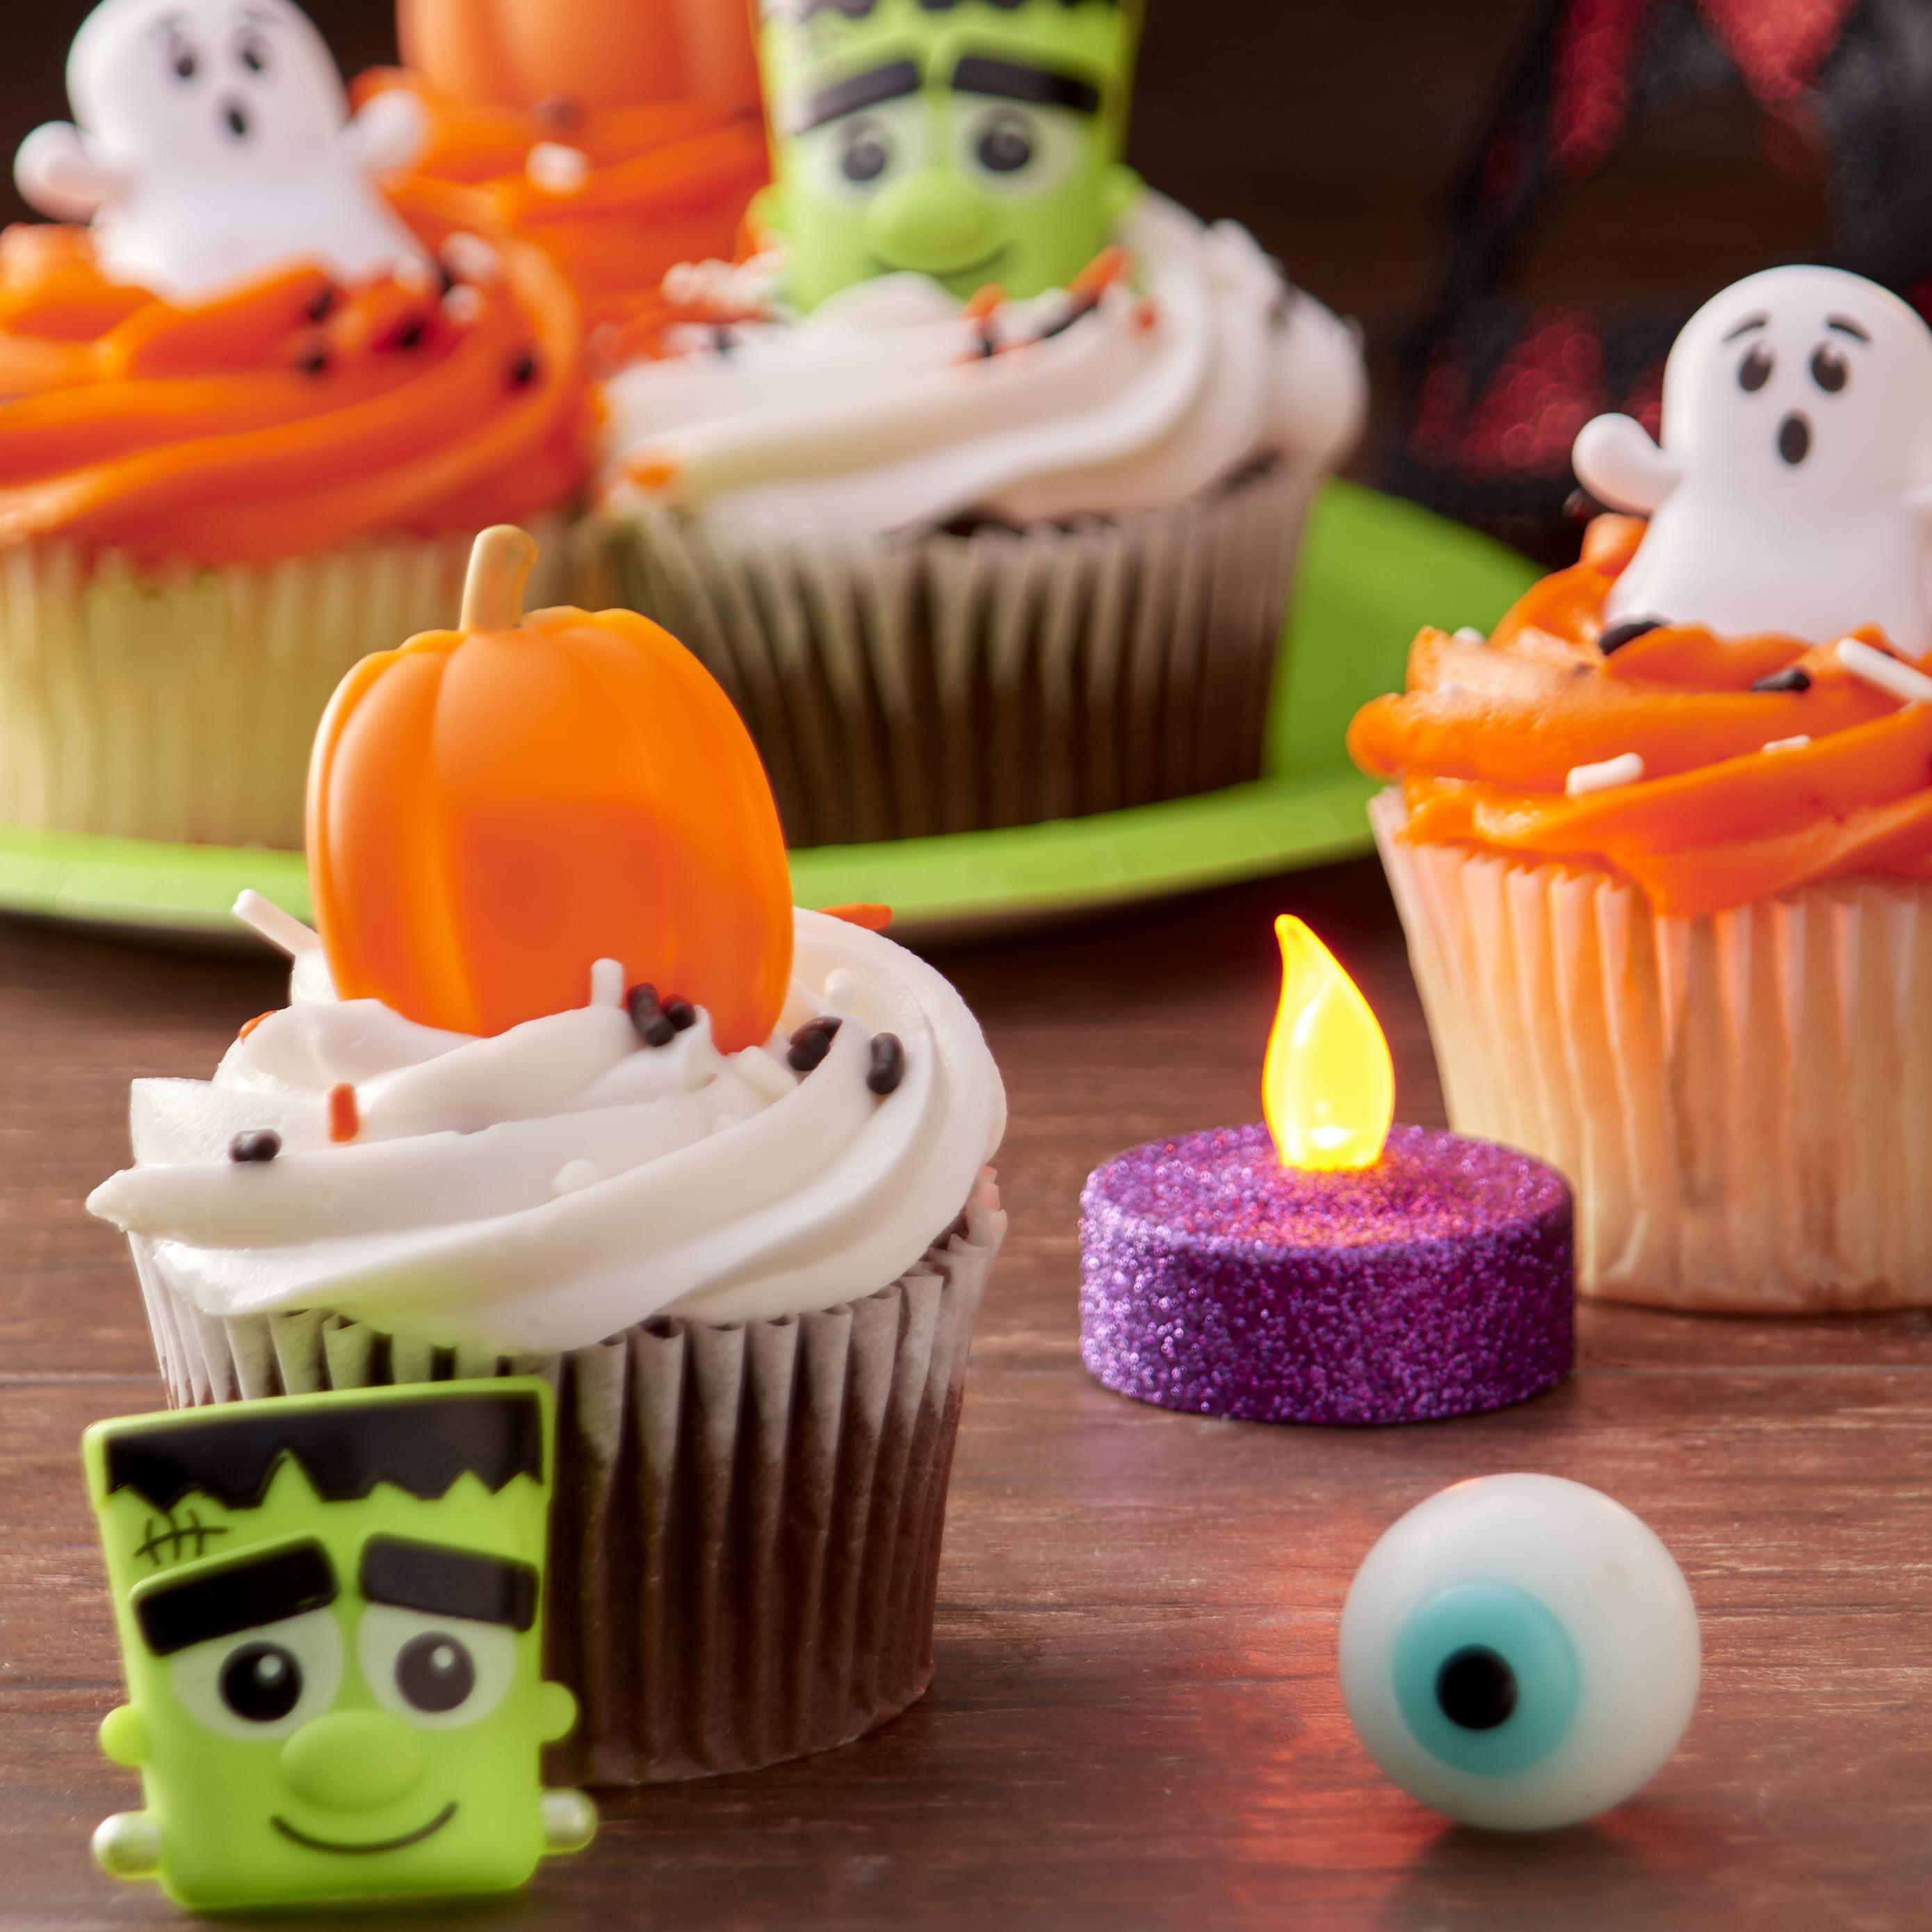 Kimberleys Halloween Cupcakes 12 Count Walmart Com Walmart Com